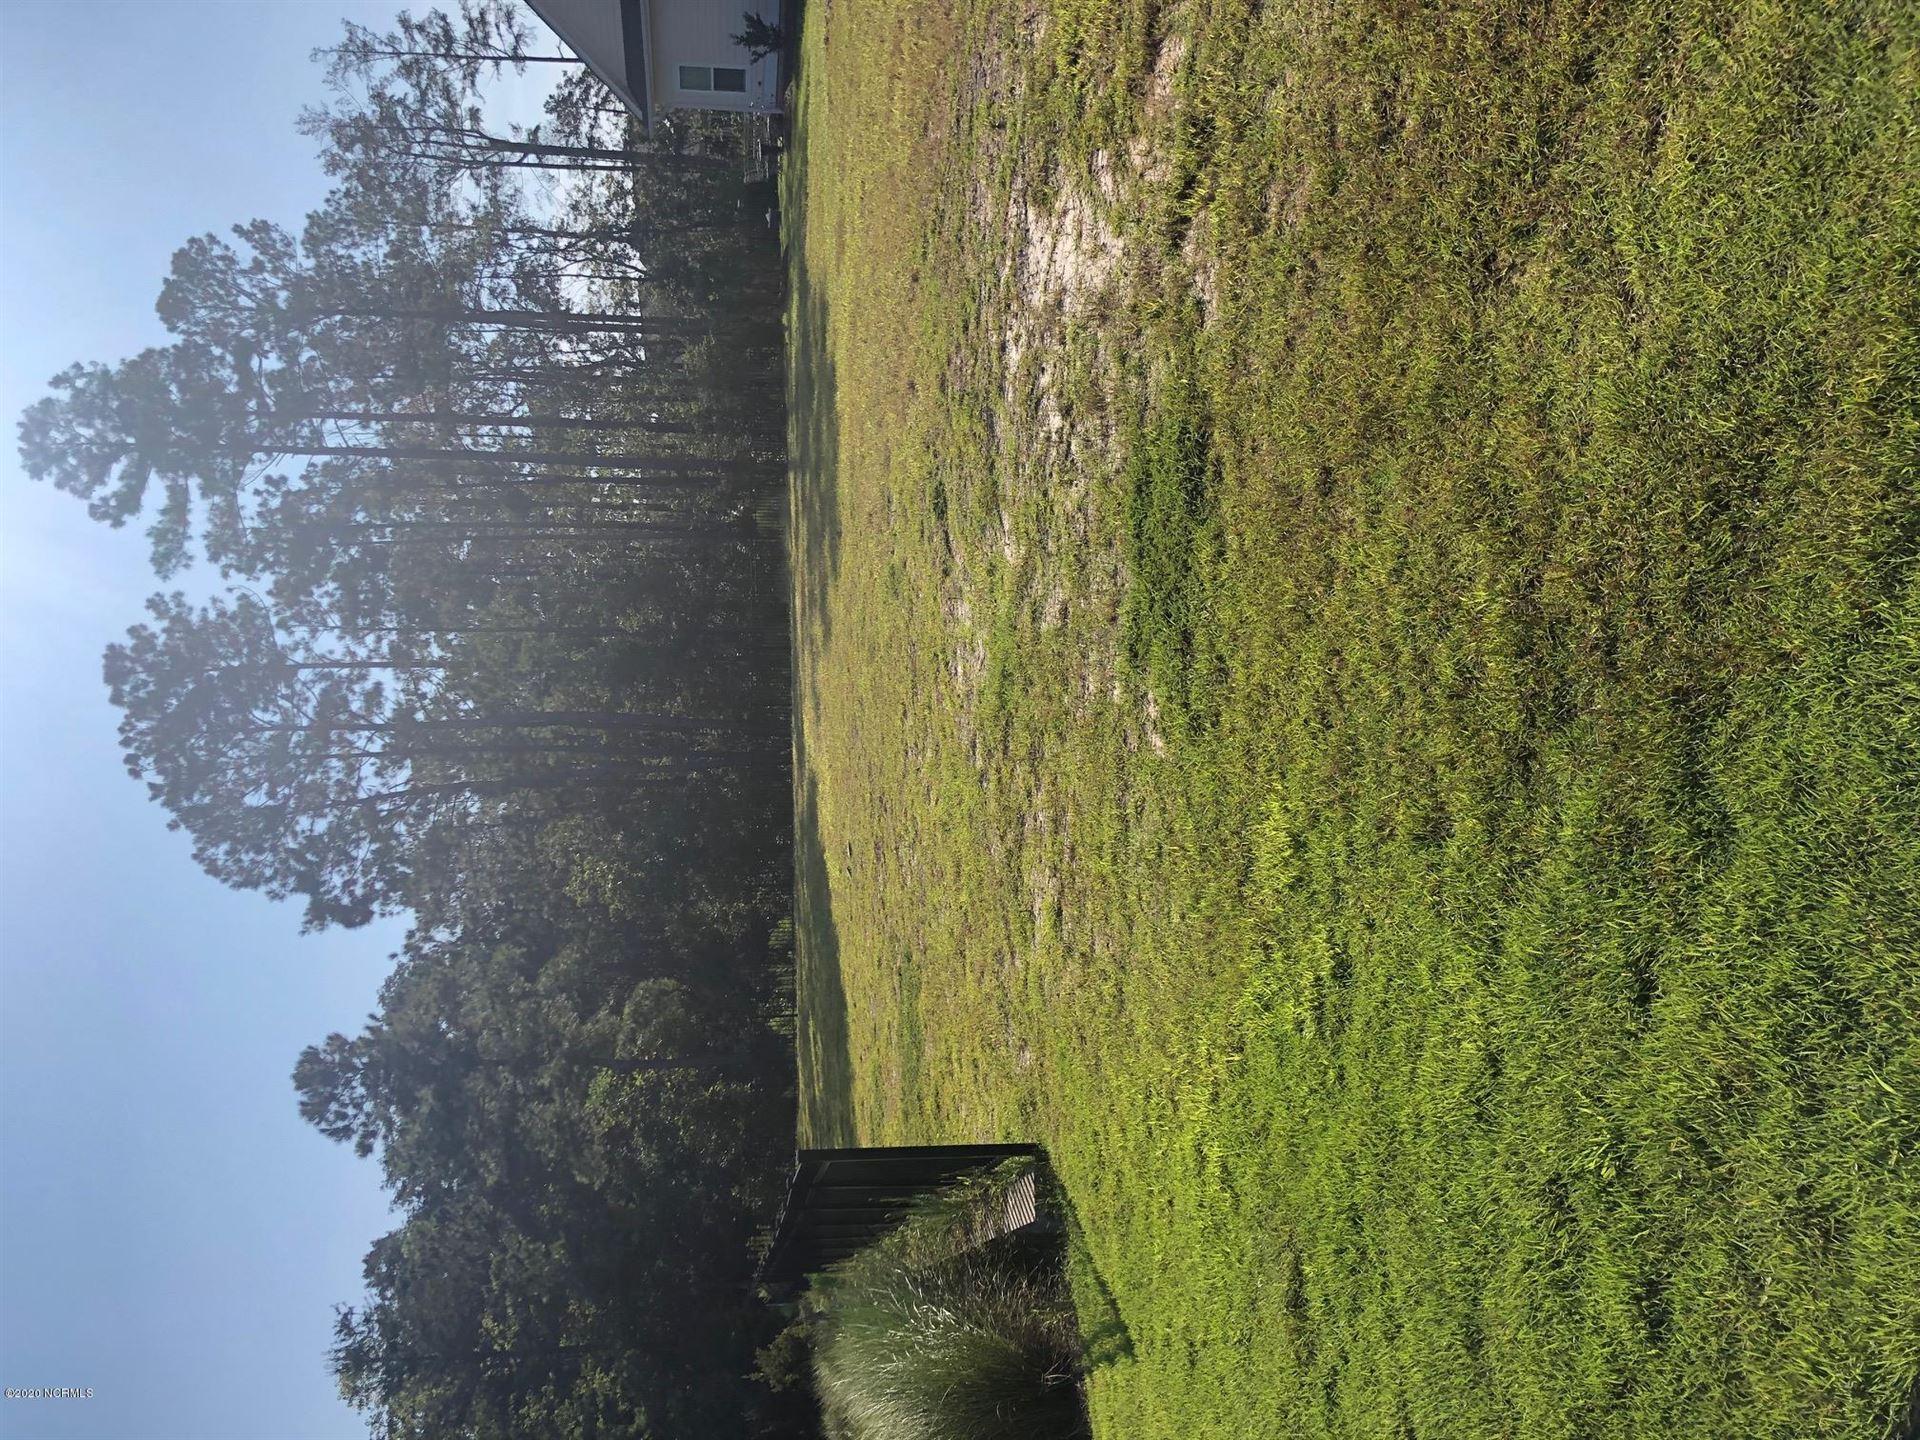 Photo for 3109 Smeades Drive, Leland, NC 28451 (MLS # 100235457)